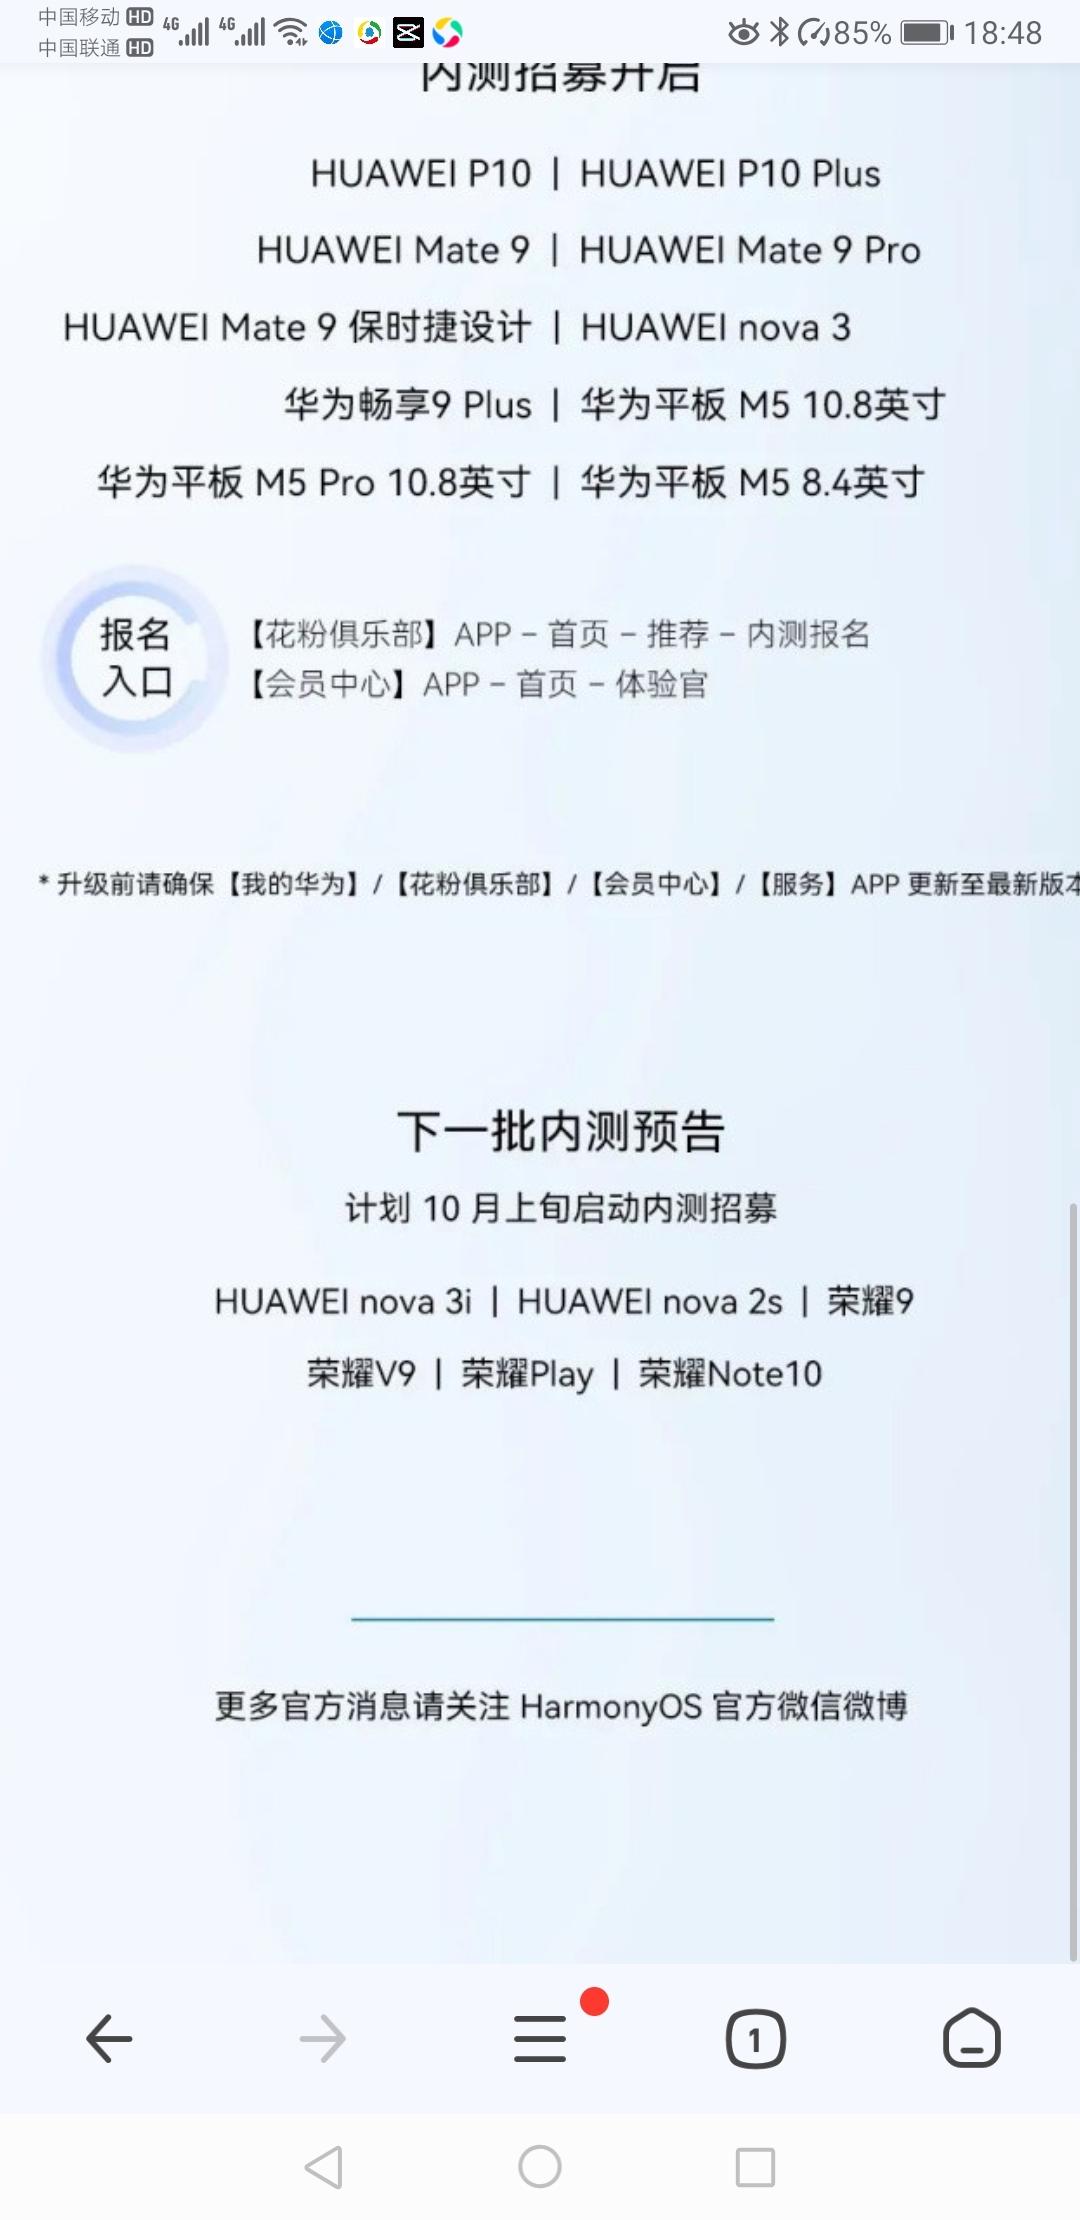 Screenshot_20210915_184842_com.qihoo.browser.jpg